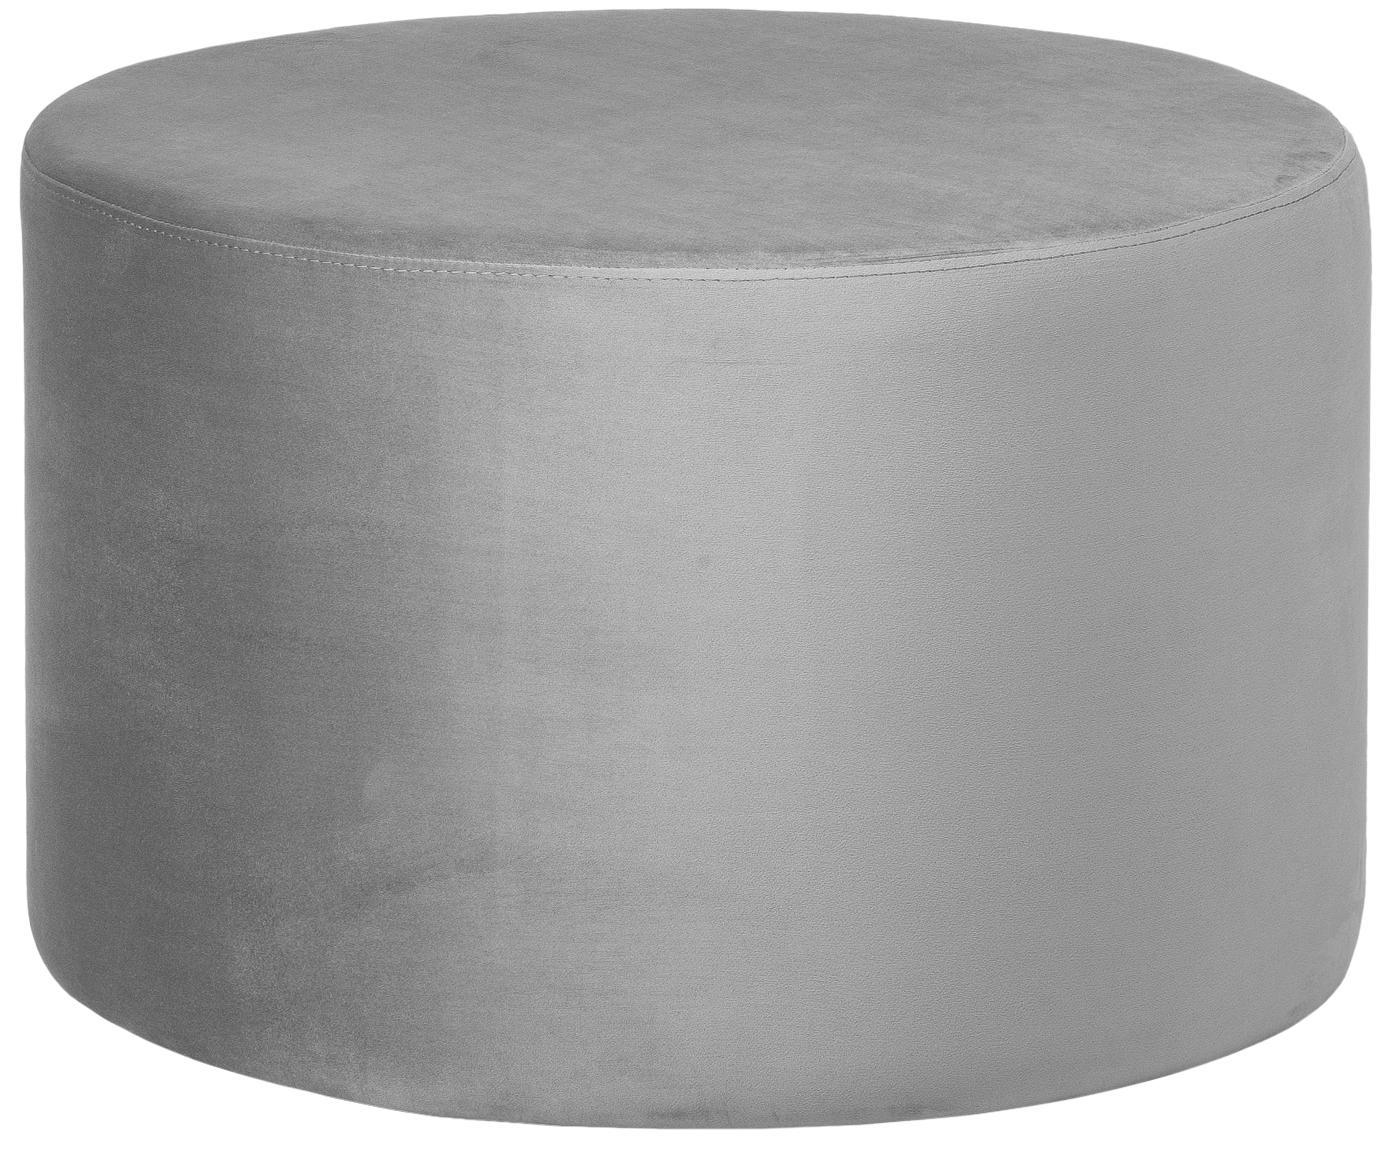 Puf de terciopelo Daisy, Tapizado: terciopelo (poliéster) 15, Estructura: tablero de fibras de dens, Gris, Ø 62 x Al 41 cm